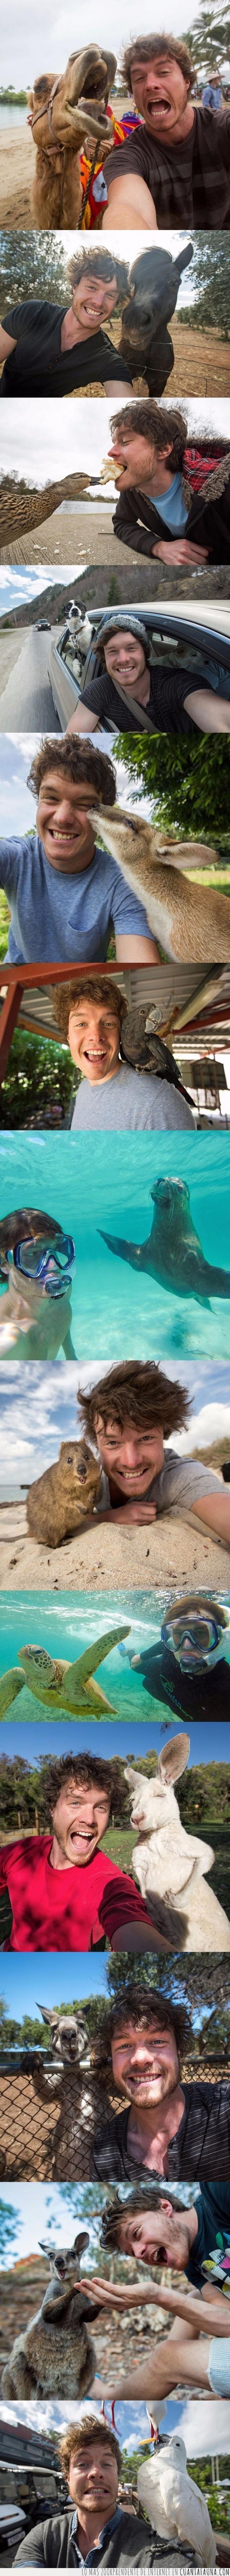 Allan Dixon,animal,canguro,loro,quokka,selfie,zoo